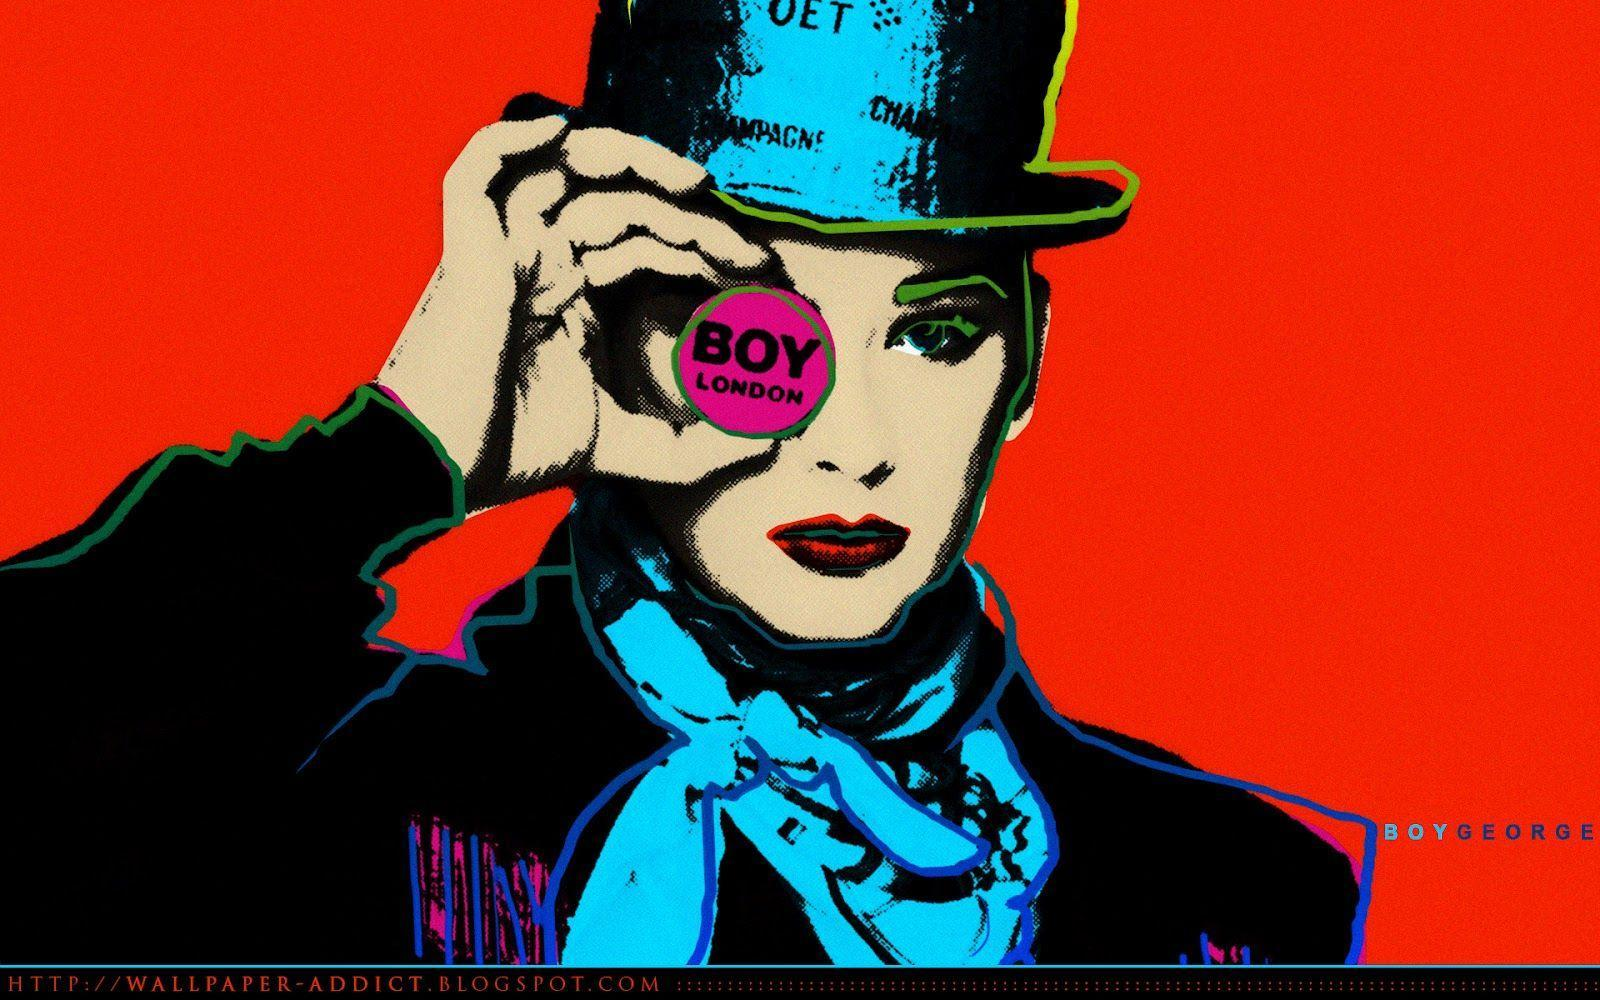 W A L L P A P E R - A D D I C T: Remember Warhol